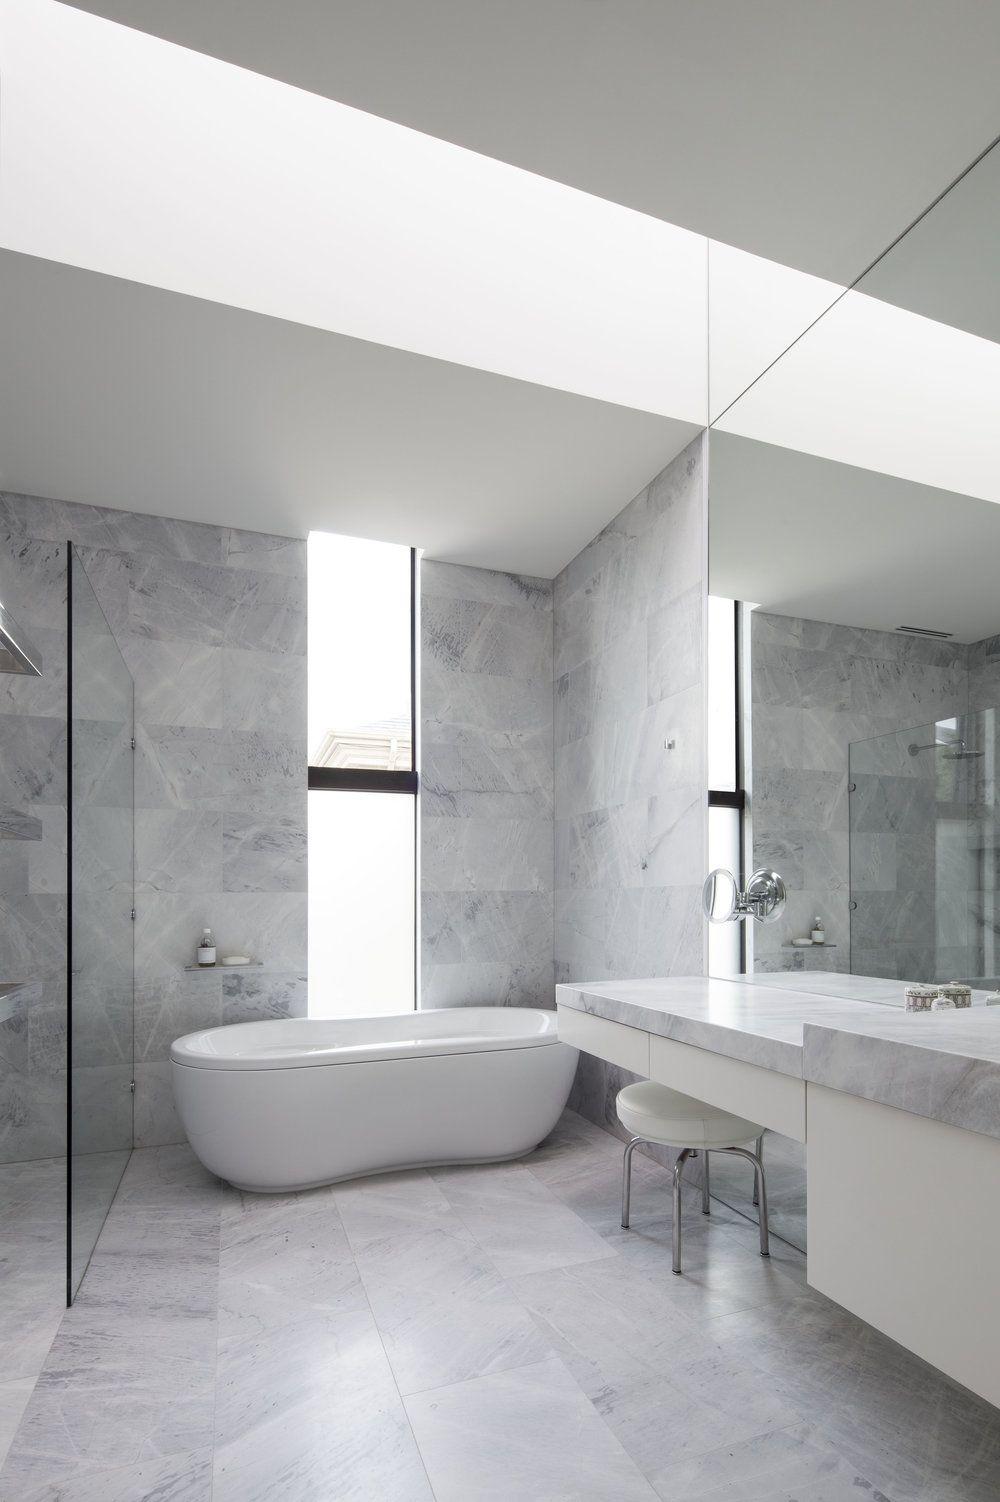 Mulgoa St_Matyas Architects_MG_2135_EDITED.jpg | Bathroom ...